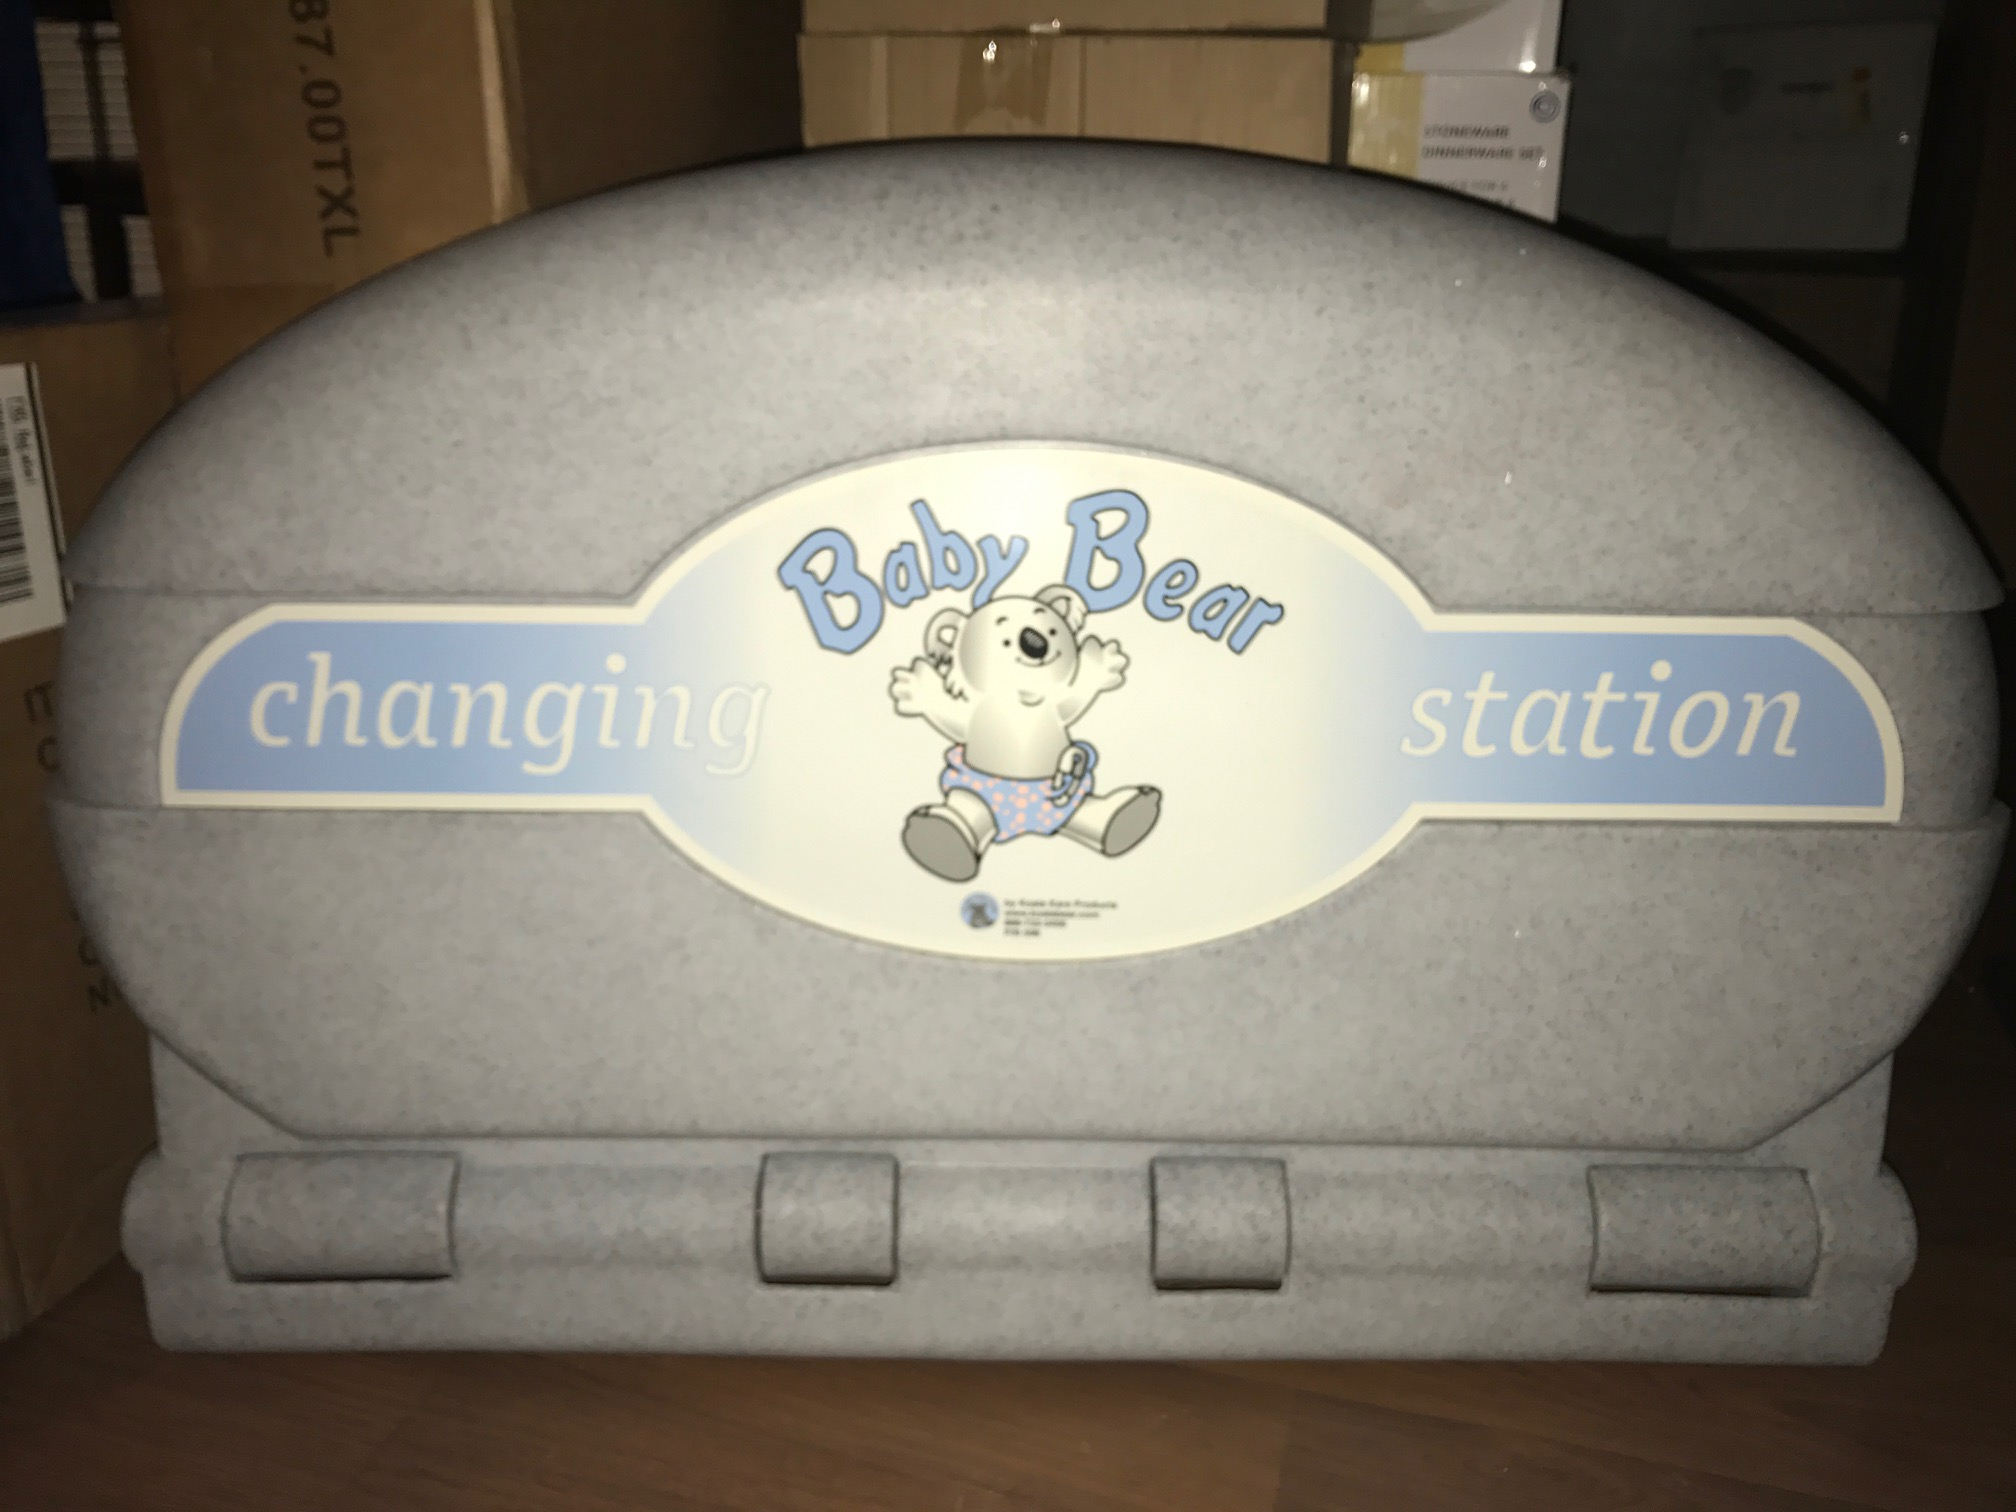 Baby Changing Station.jpg